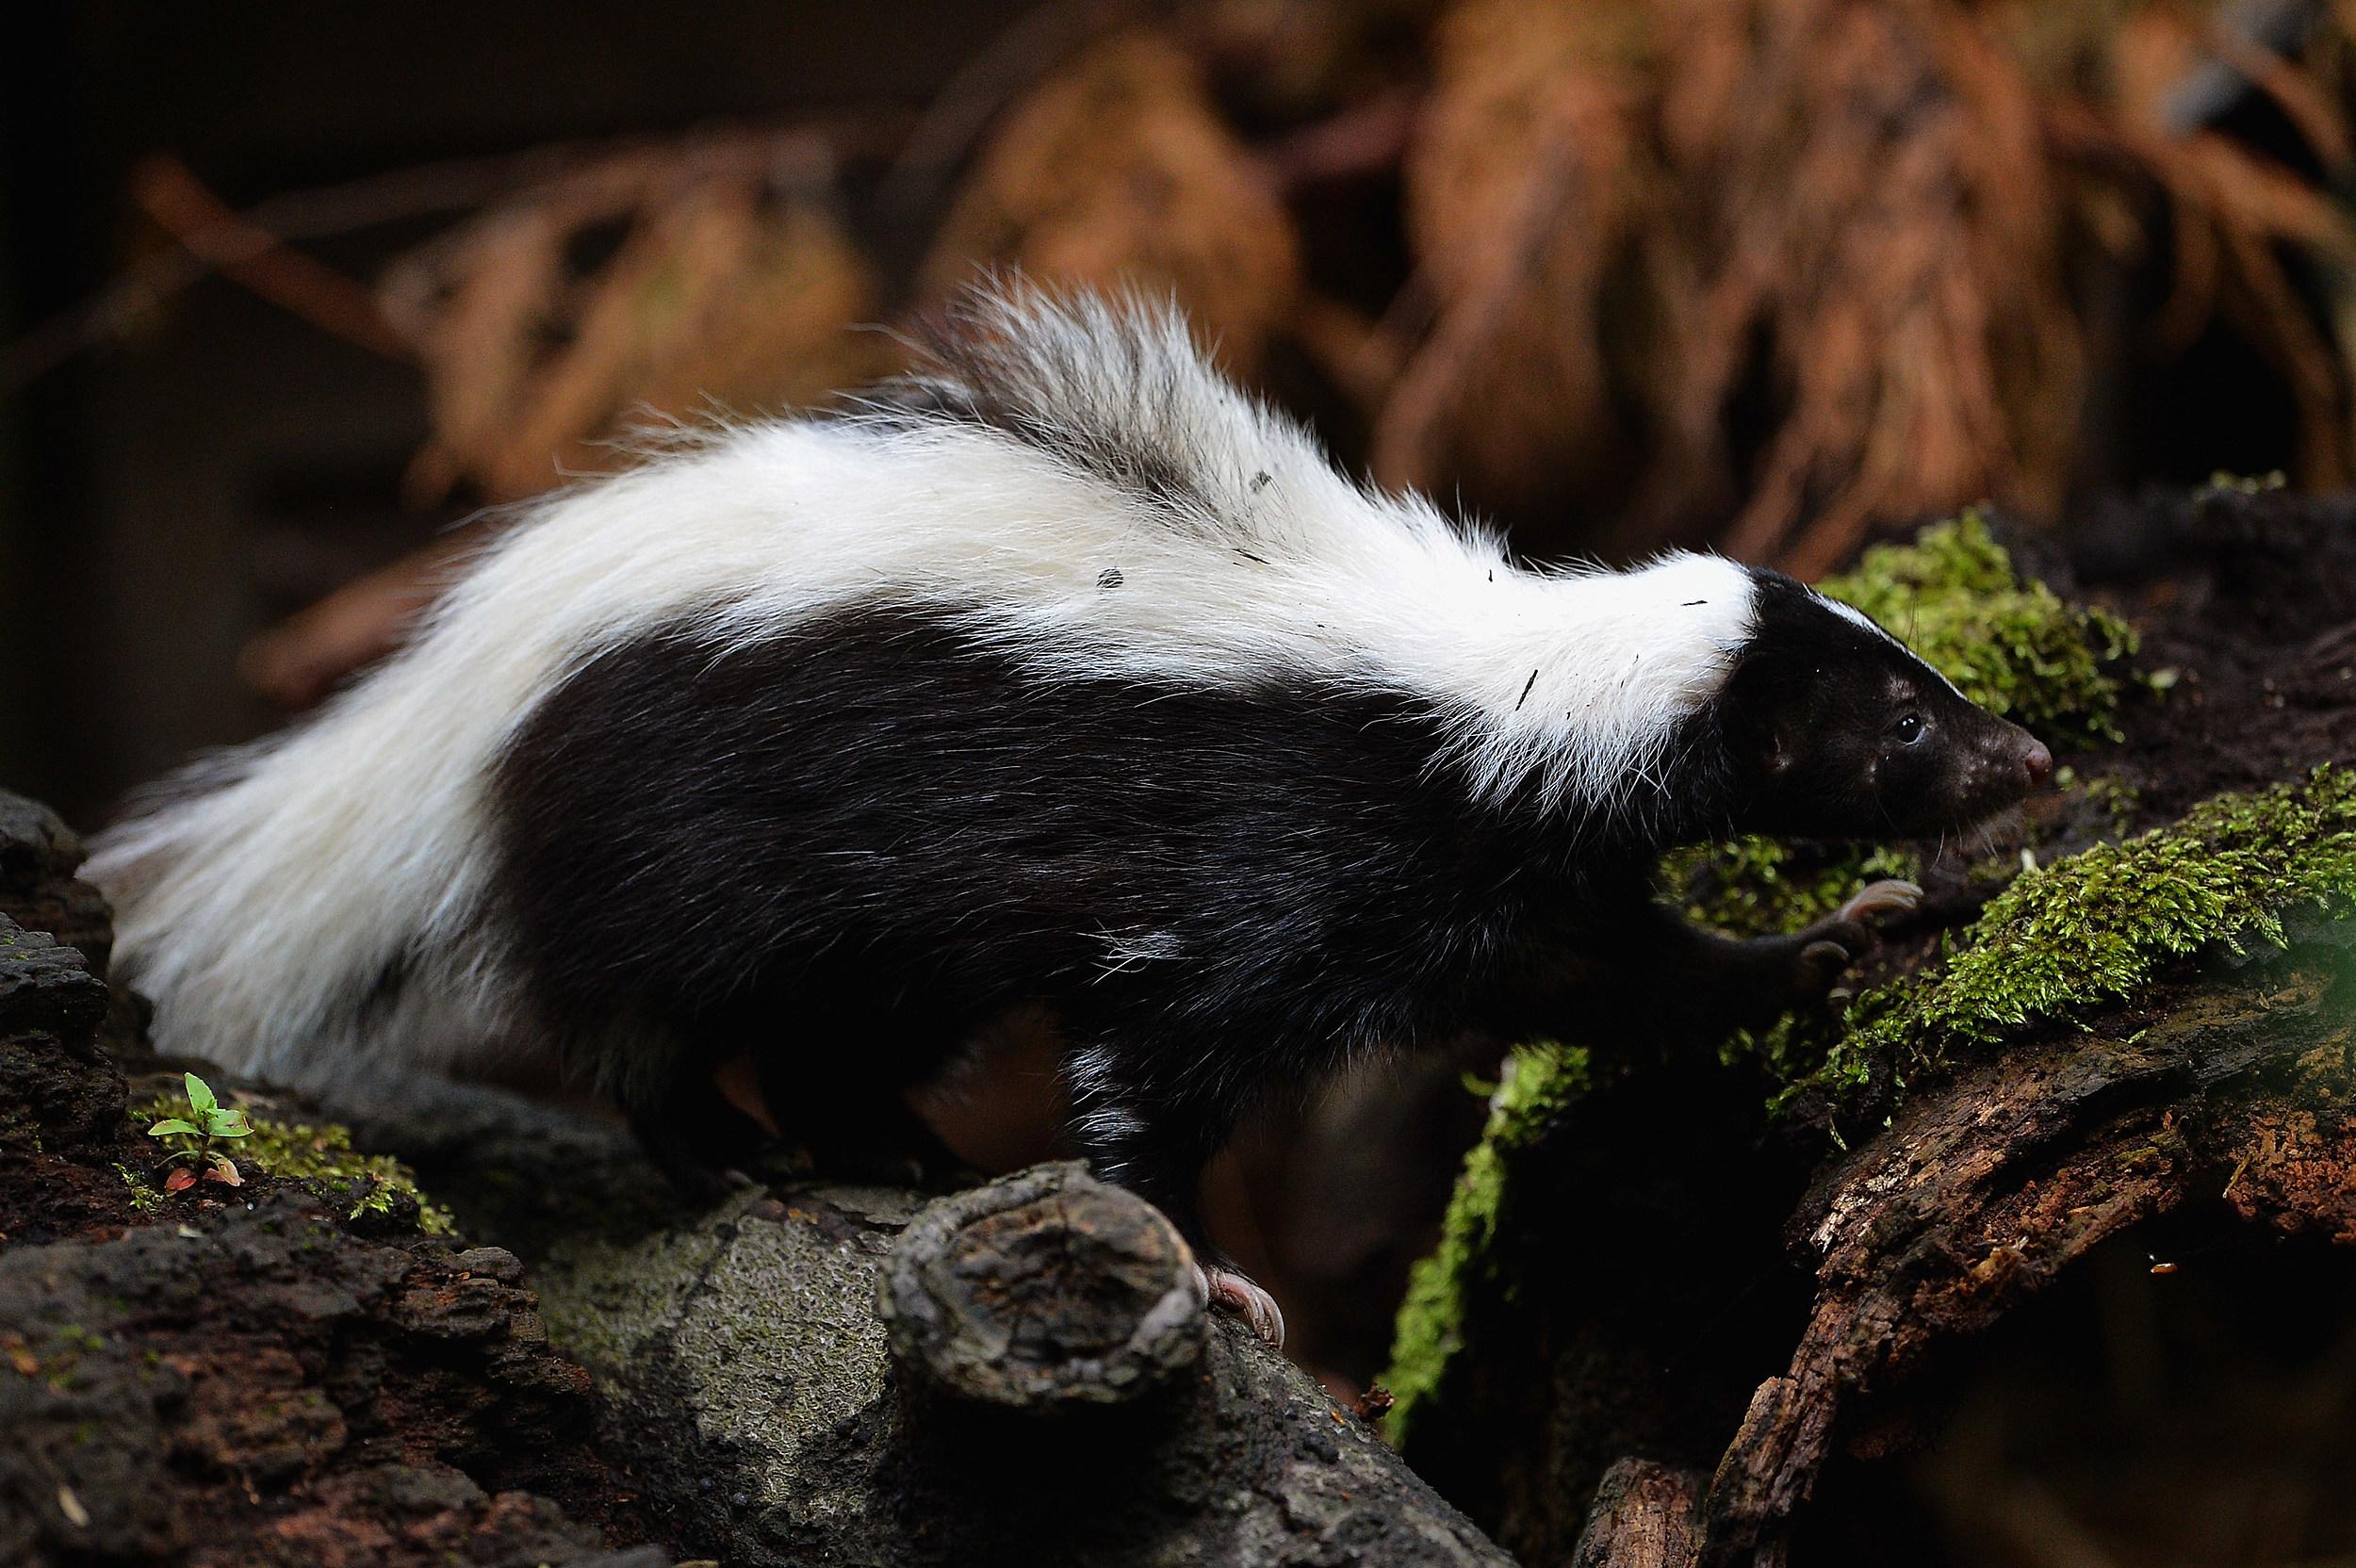 skunks lingering around try this natural diy skunk repellent